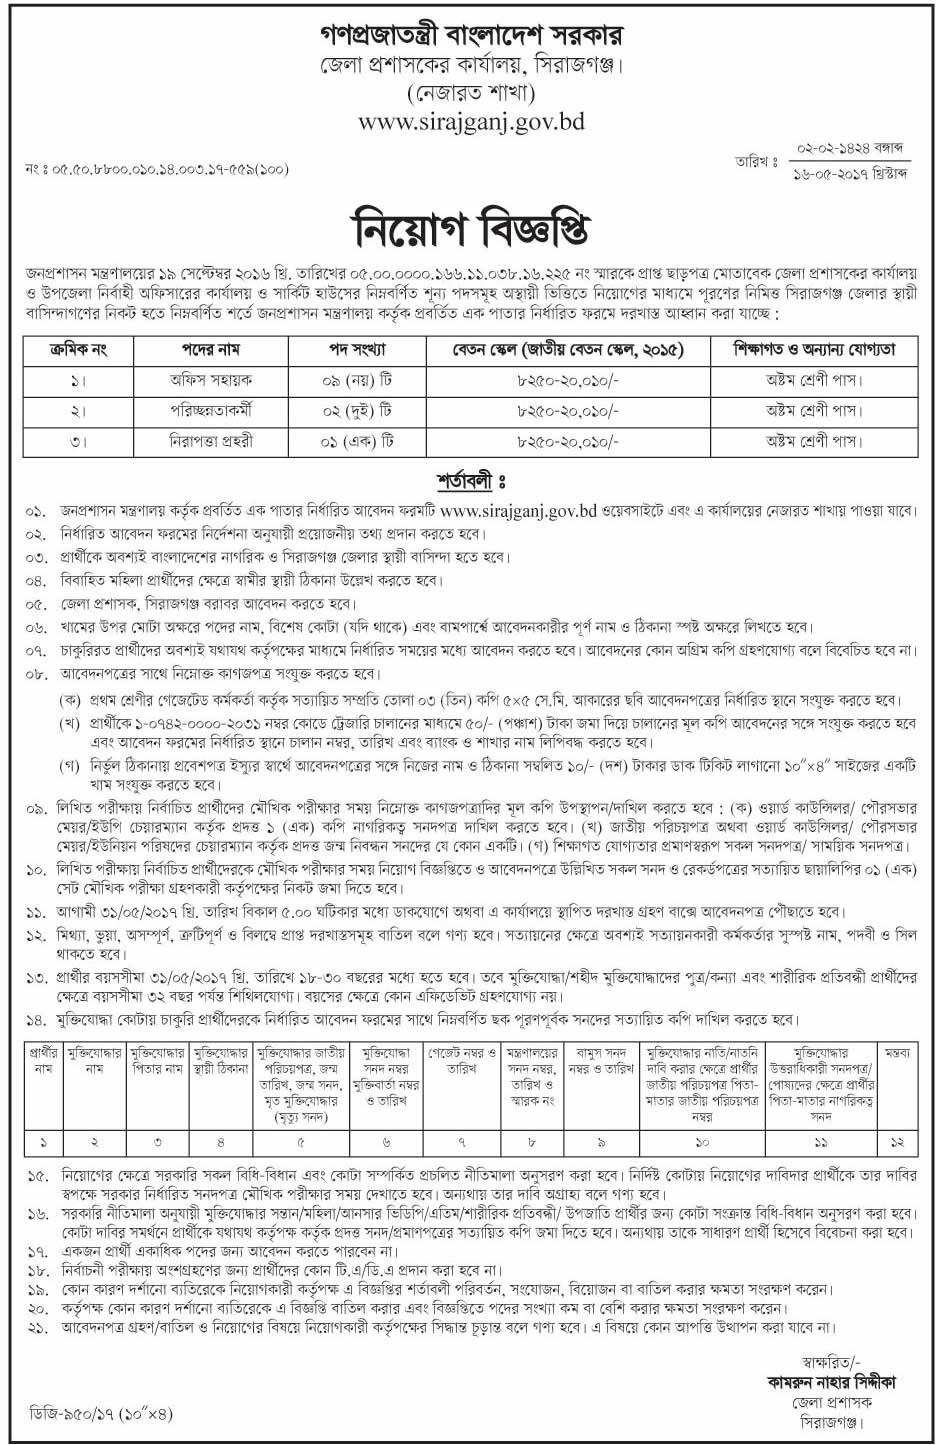 Sirajganj Deputy Commissioner's Office Job Circular 2017